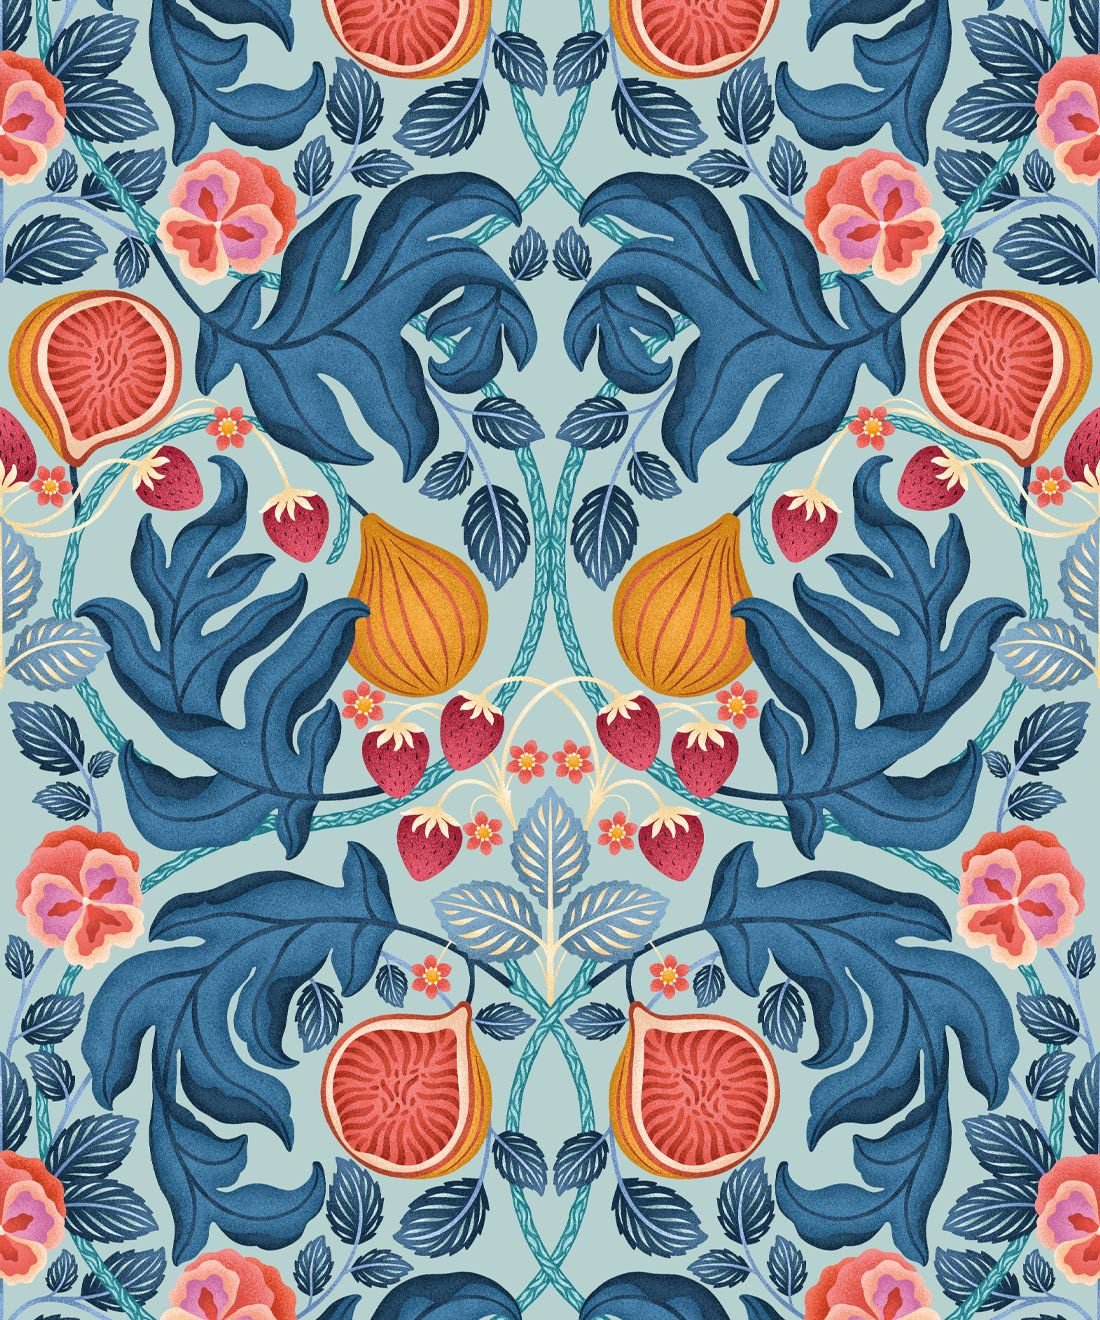 Figs & Strawberries Wallpaper